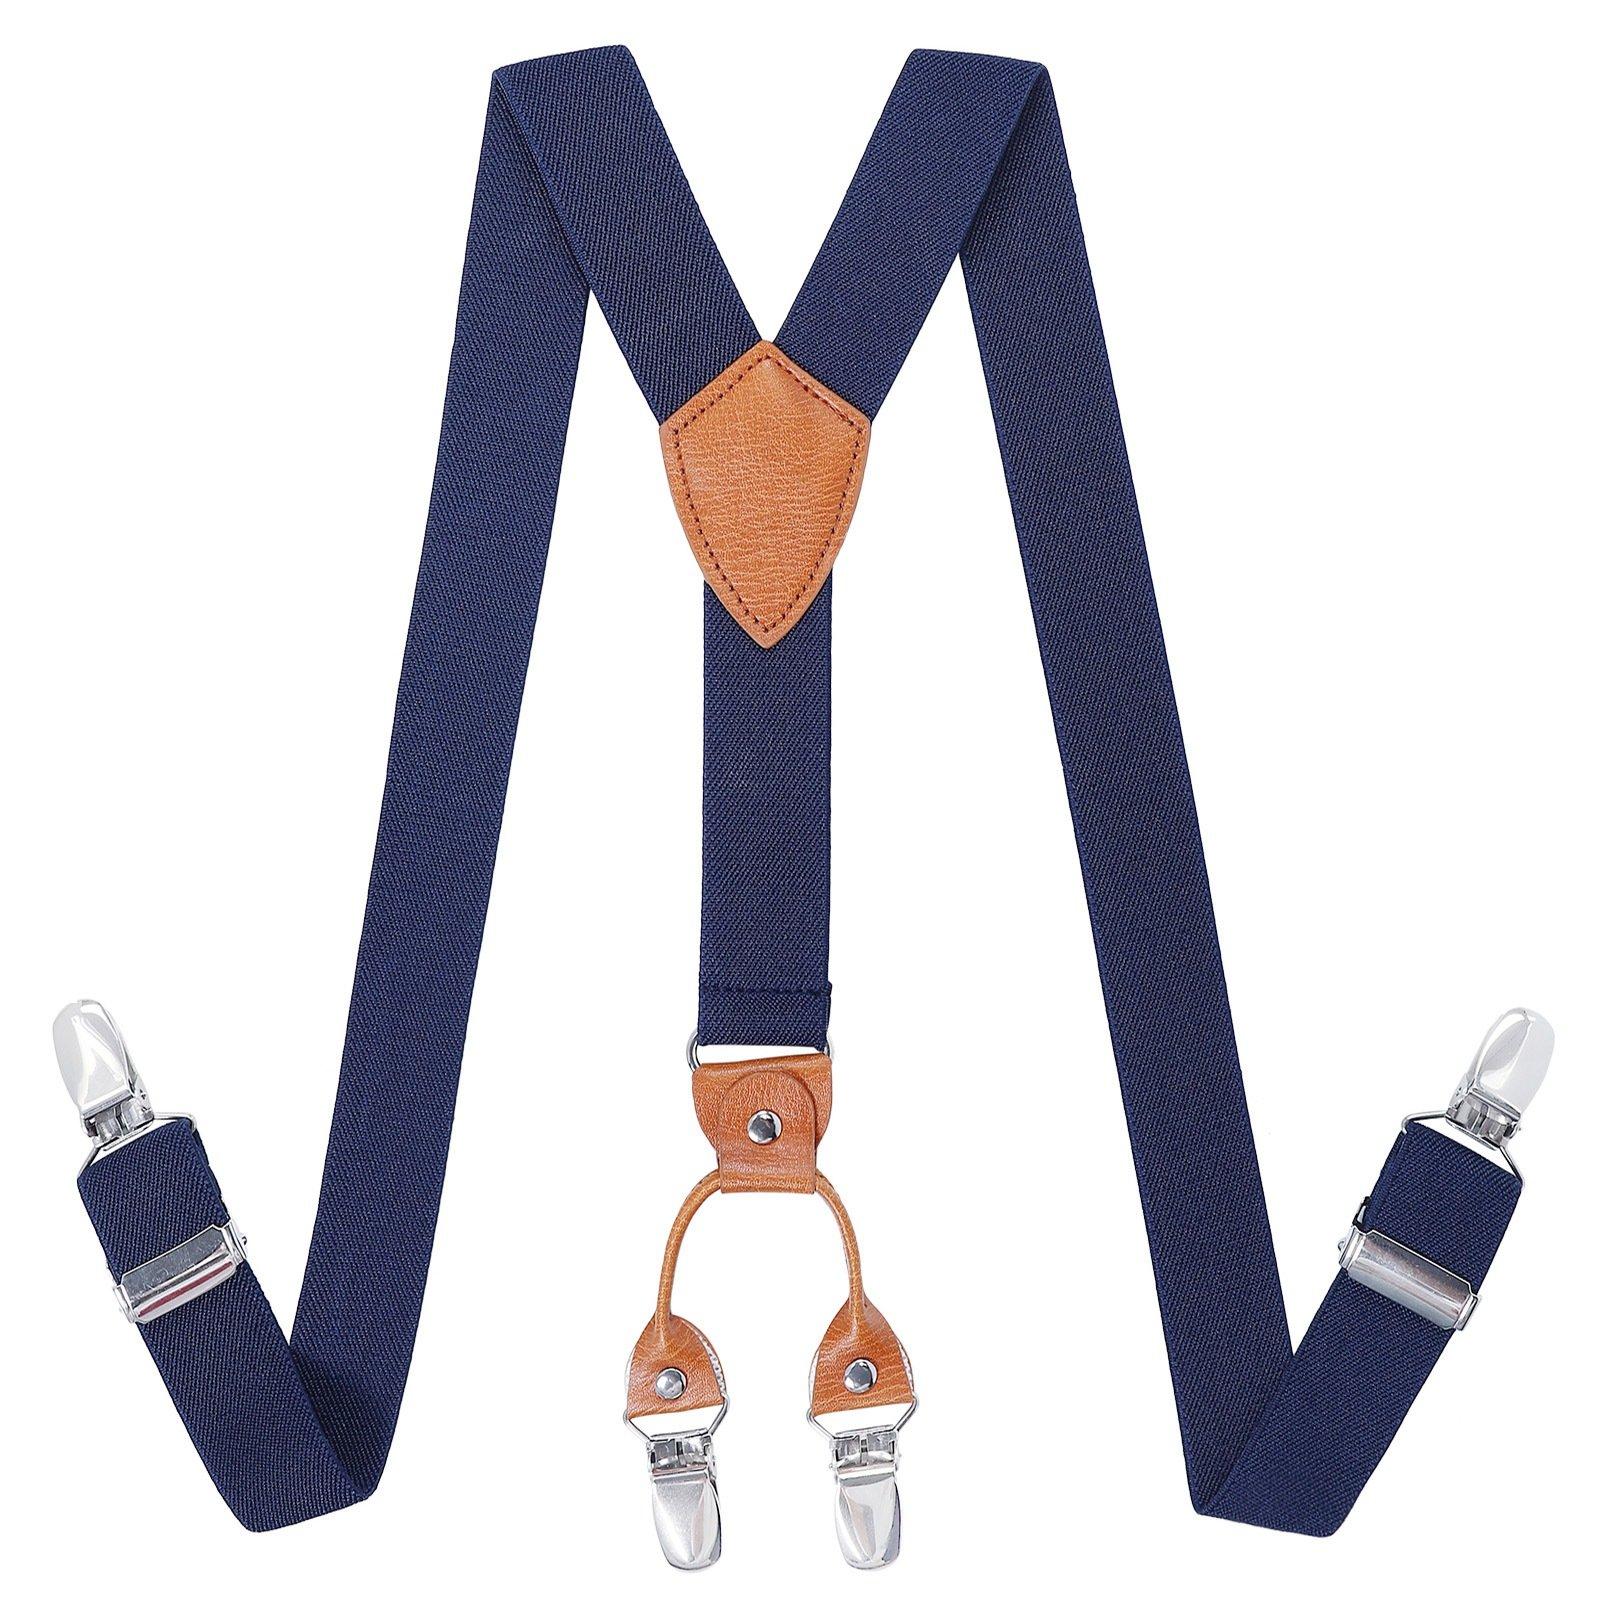 Kajeer Toddlers Boys Mens Adjustable Suspenders - Y Back Heavy Duty Suspenders for School Uniforms Tuxedos (43.3 Inch (5 Feet Tall - 9 Feet Tall), Navy blue)